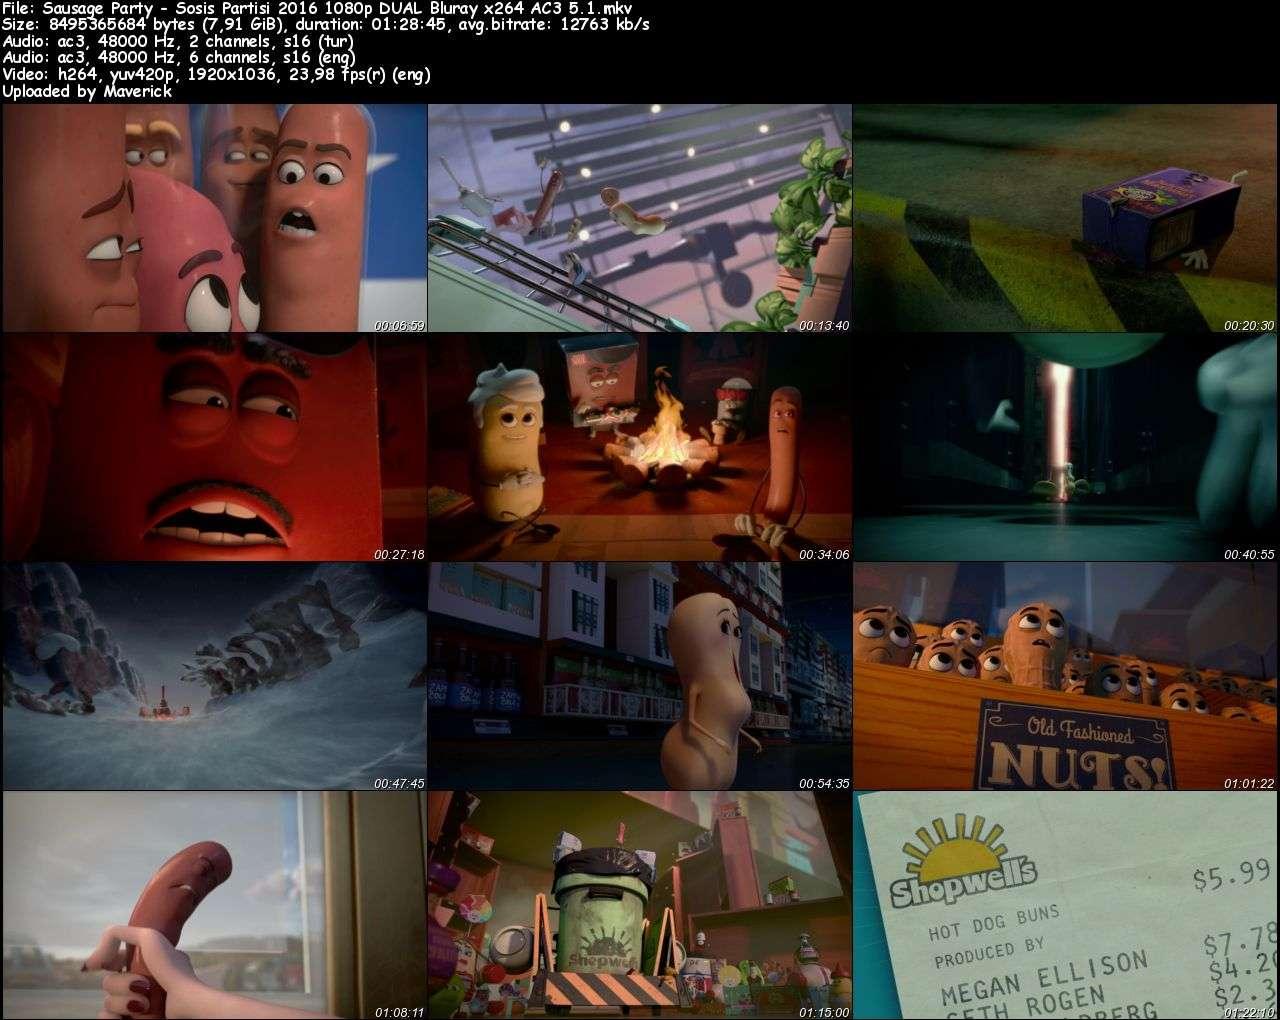 Sosis Partisi - 2016 BluRay 1080p DuaL MKV indir